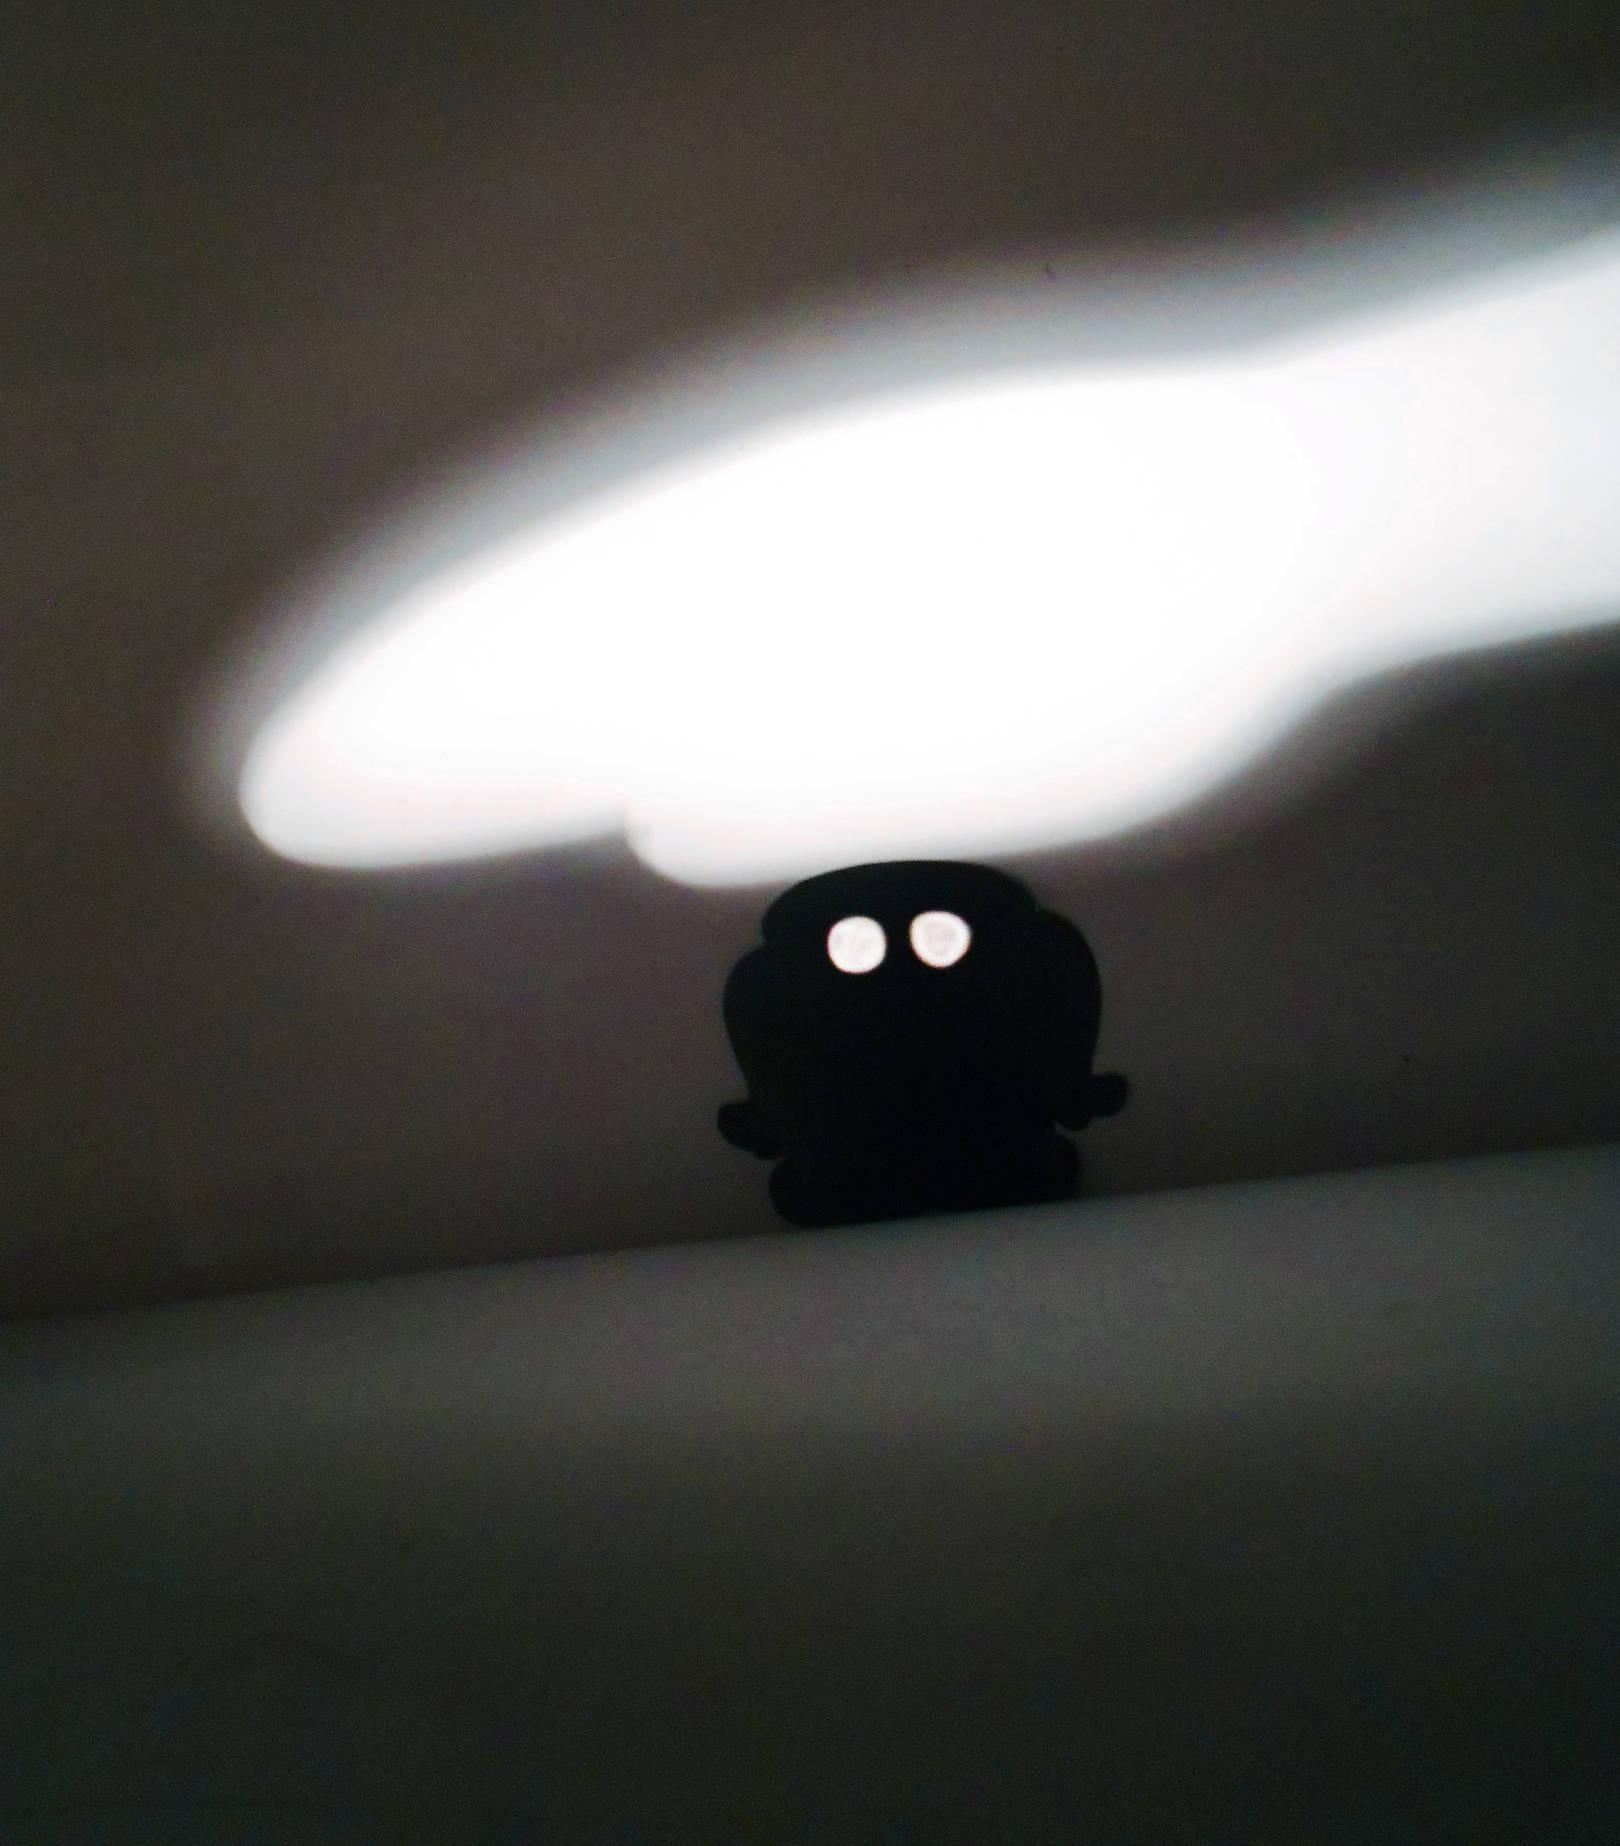 Игра света с тенью (Play of light with shadow)